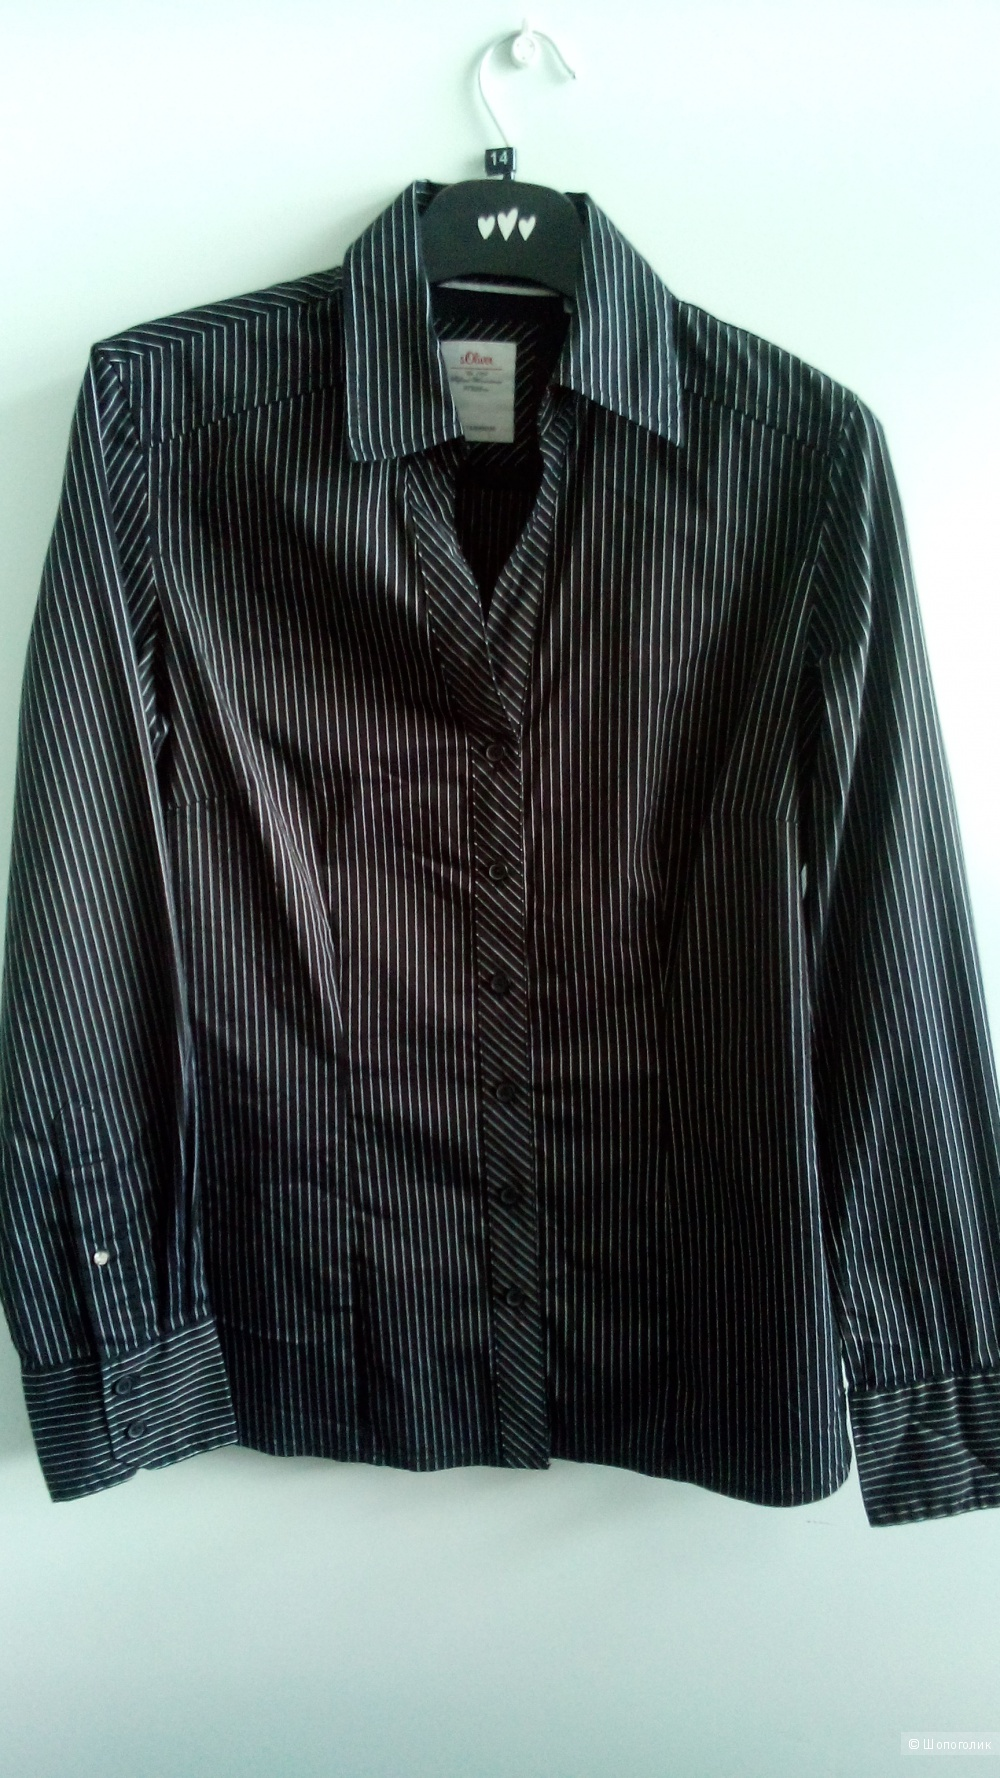 Блузка-рубашка базовая S.Oliver Германия размер M (46-48)